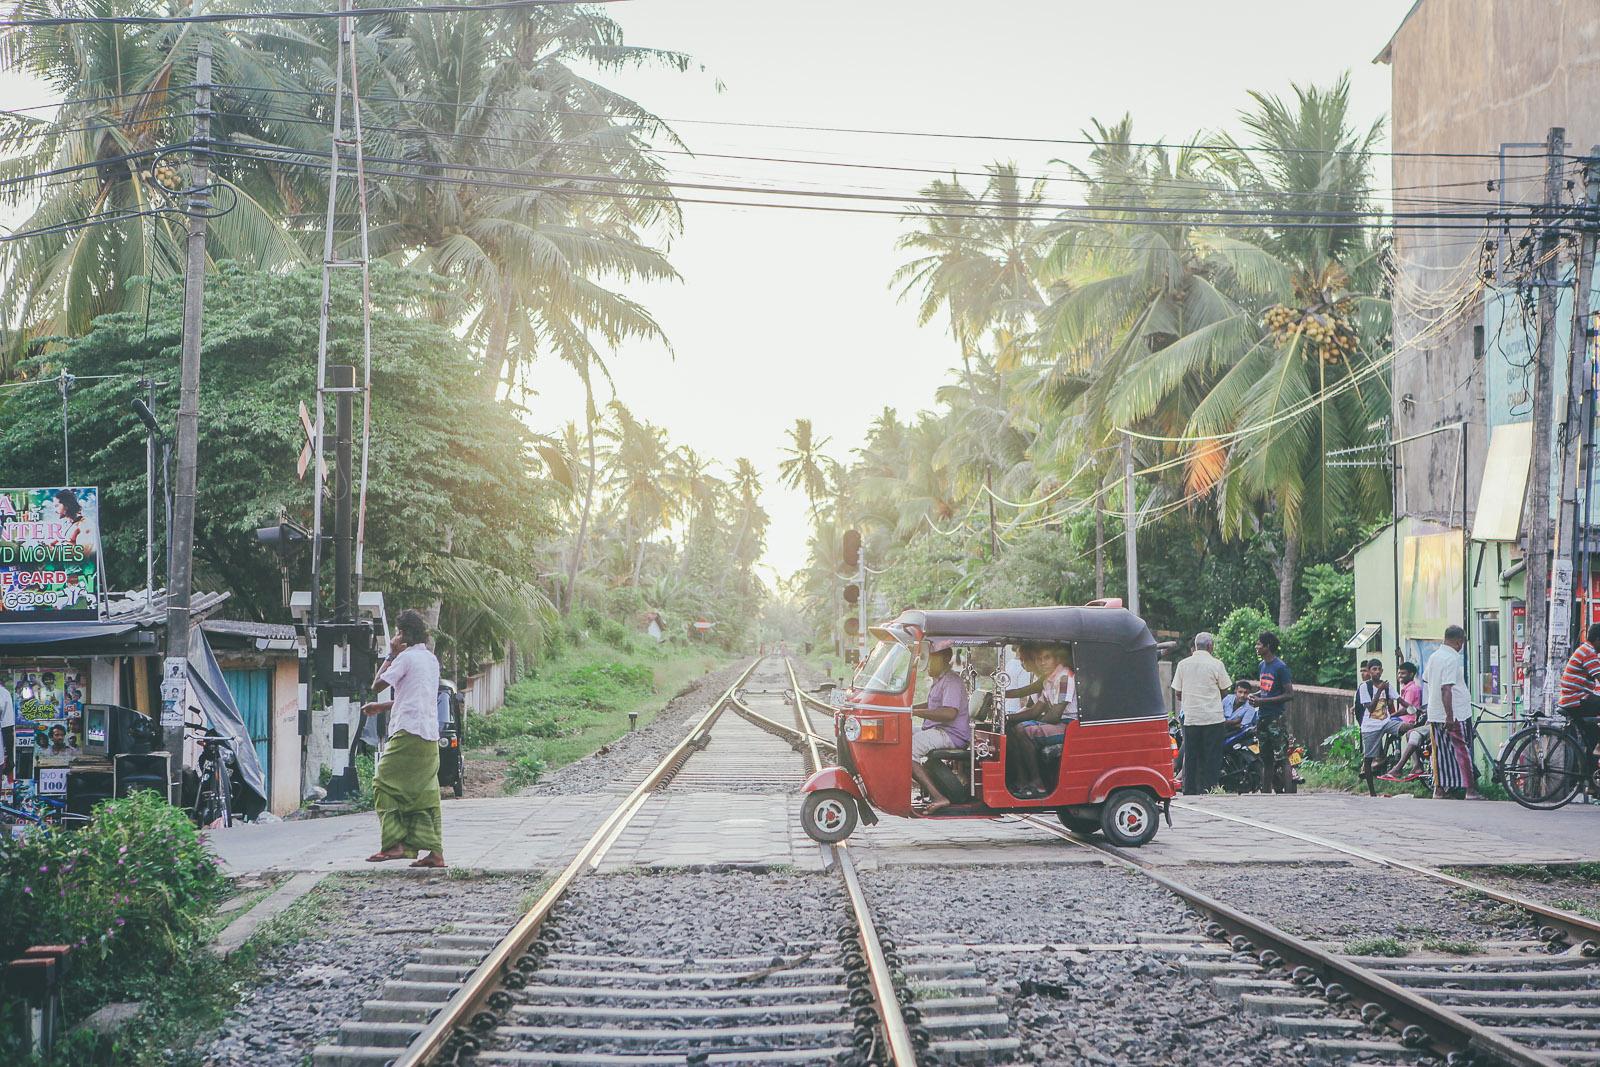 Sri Lanka-Hikkaduwa-Midigama-Aragum Bay-Sunshinestories-surf-travel-blog-IMG_4273.jpg